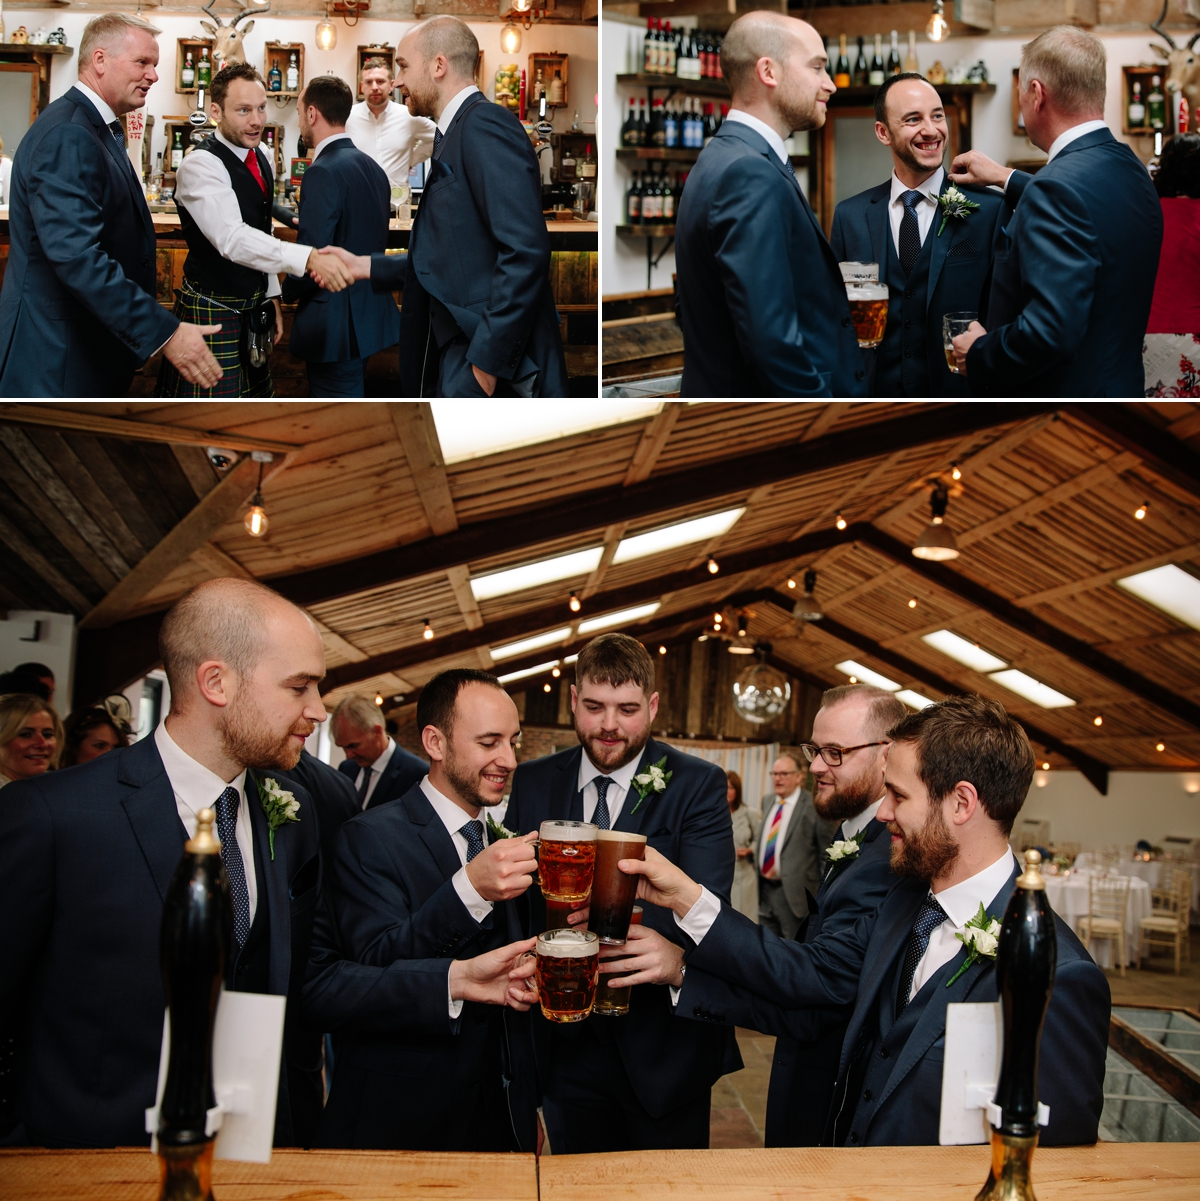 Groom and groomsmen enjoying a pre-ceremony drink